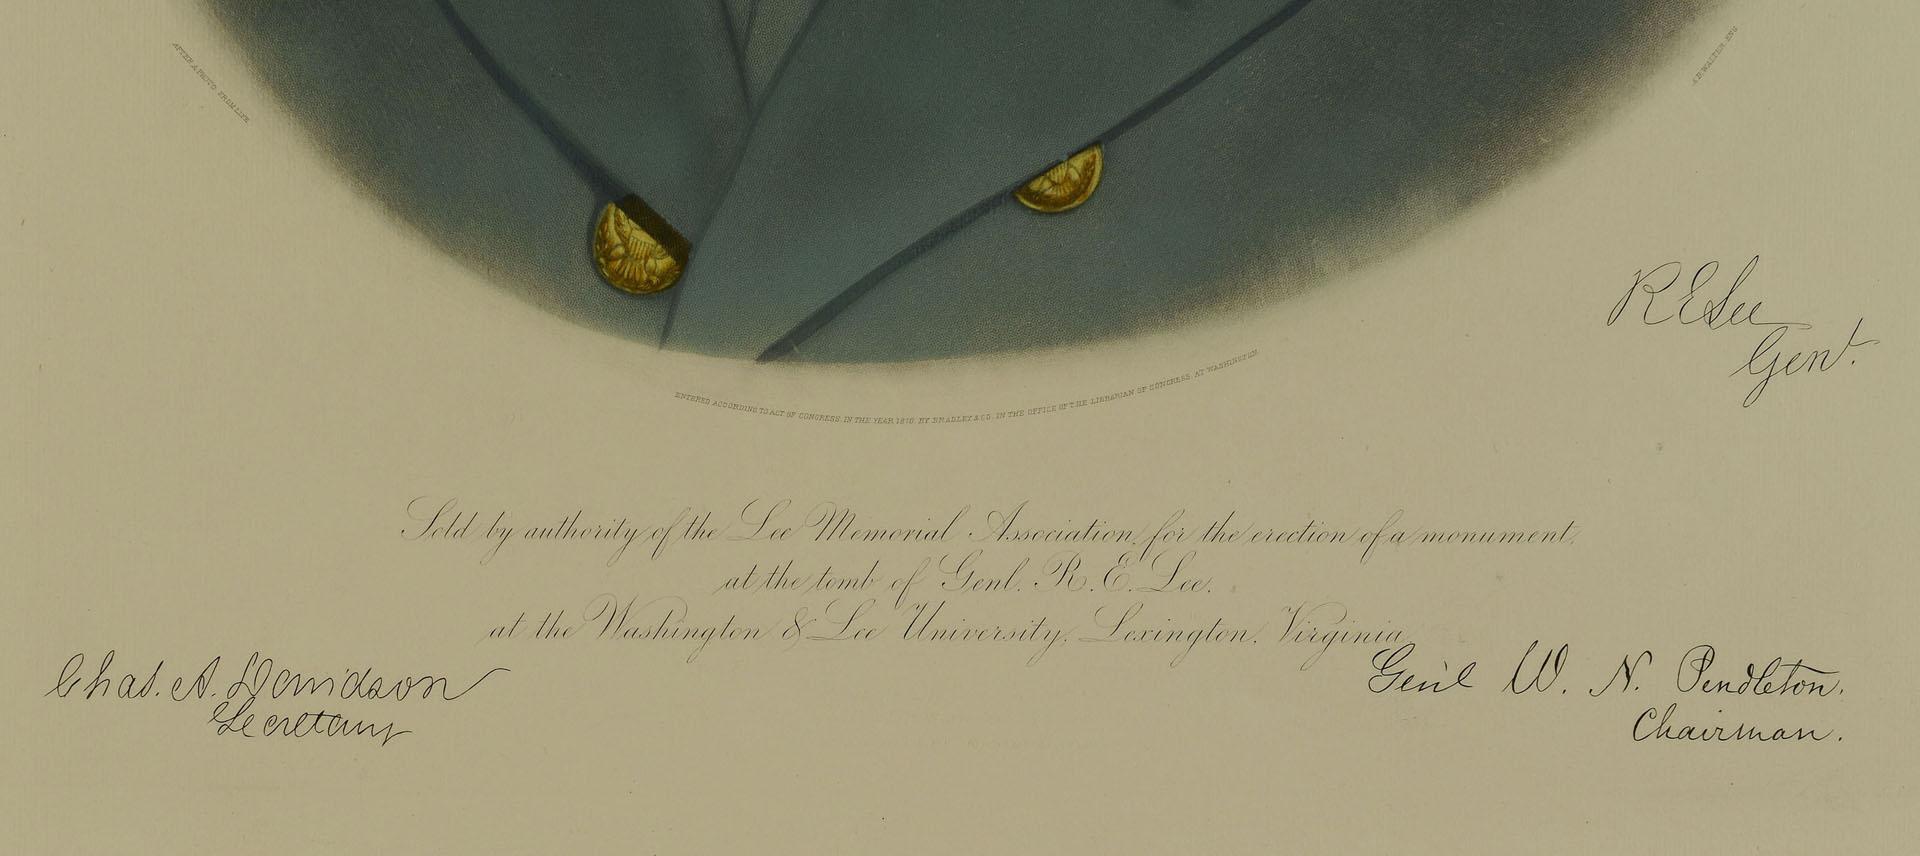 Robert E. Lee Memorial Engraved Portrait, 1870